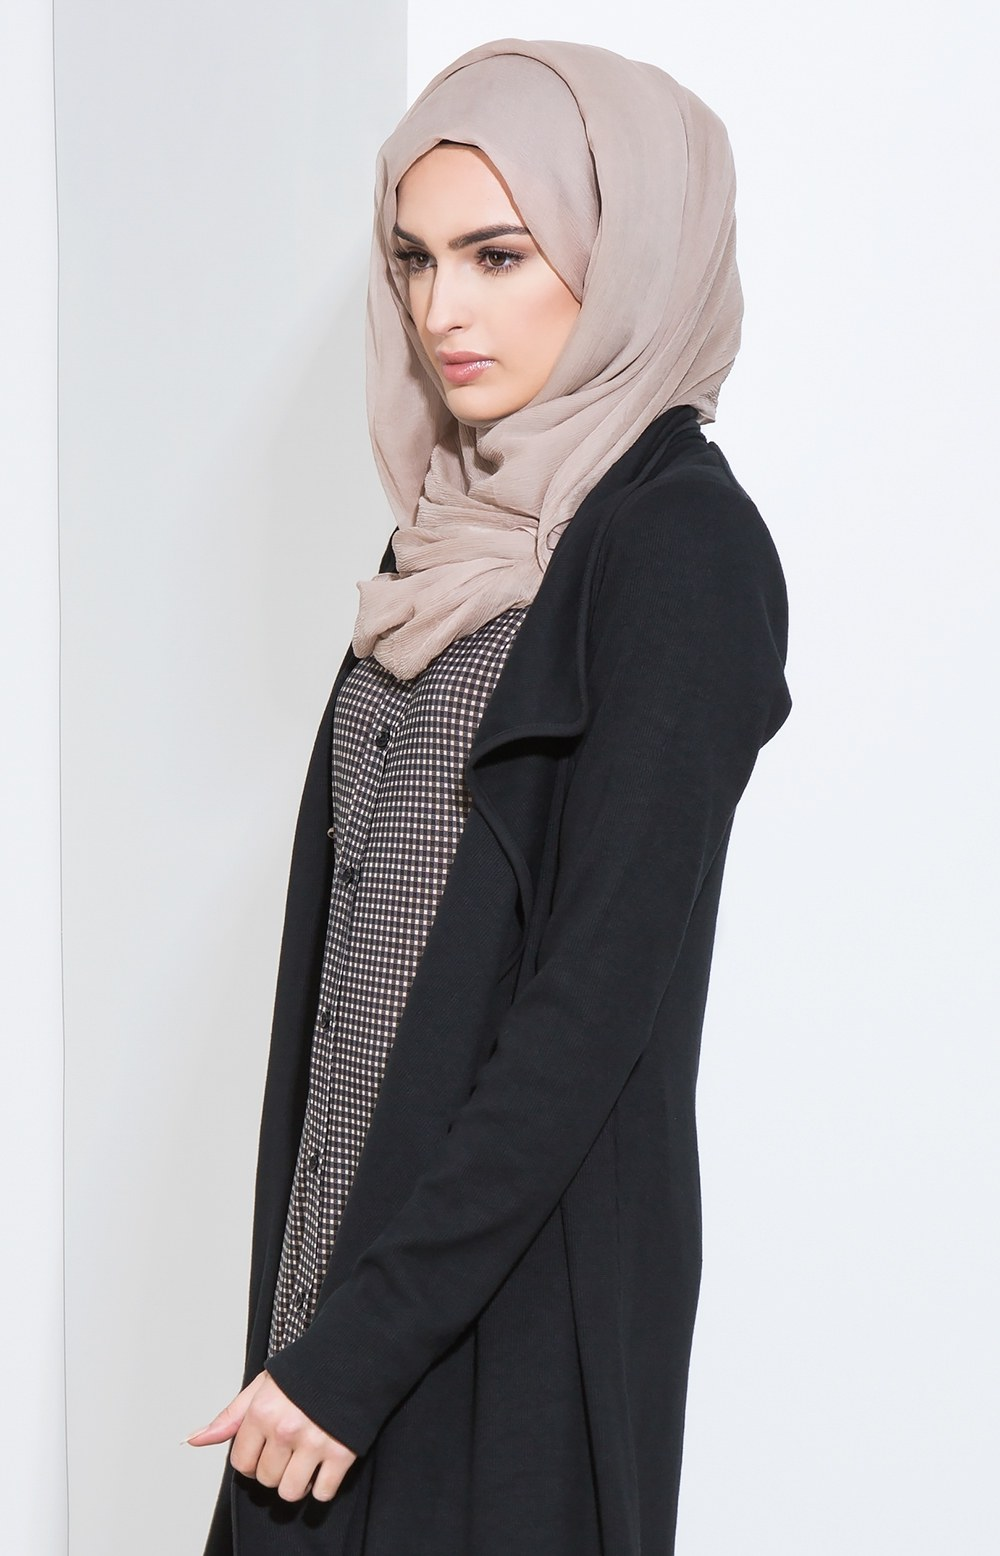 Ide Model Baju Lebaran Th Ini Bqdd 25 Trend Model Baju Muslim Lebaran 2018 Simple & Modis